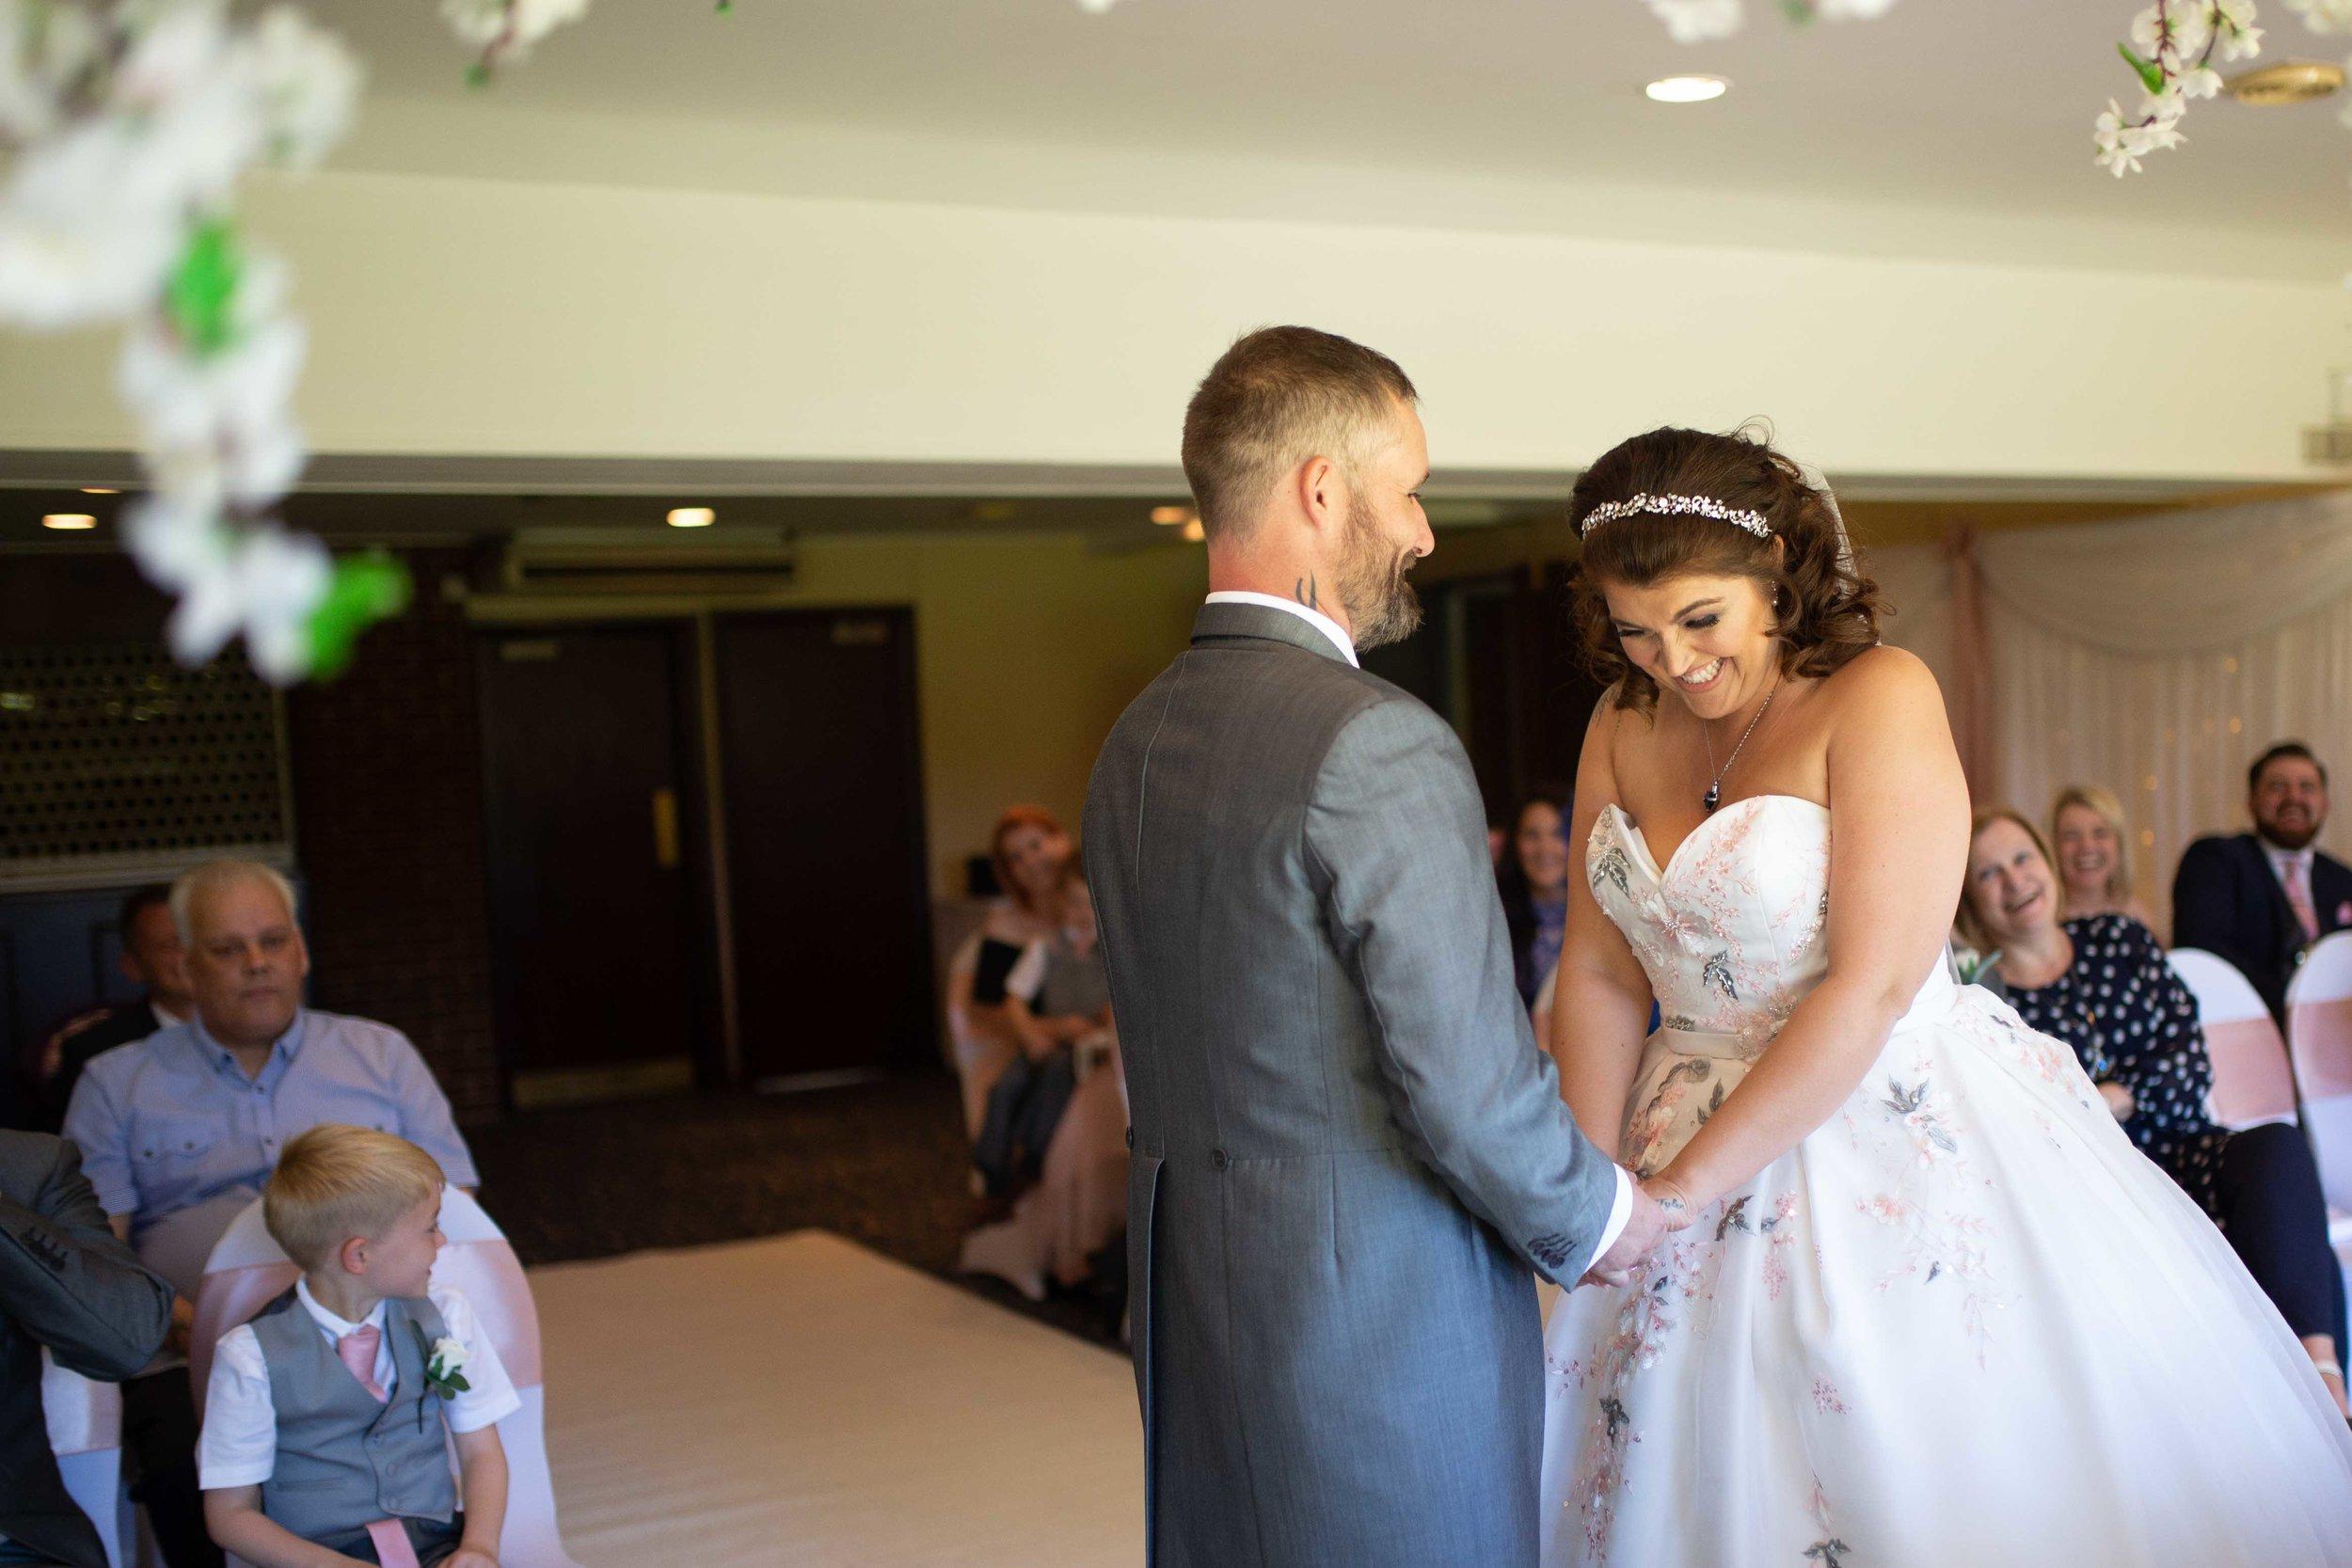 Lea-cooper-photography-wedding-photography-wolverhampton-patshull-park-hotel-wedding-pattingham-wolverhampton-west-midlands-uk-23.JPG